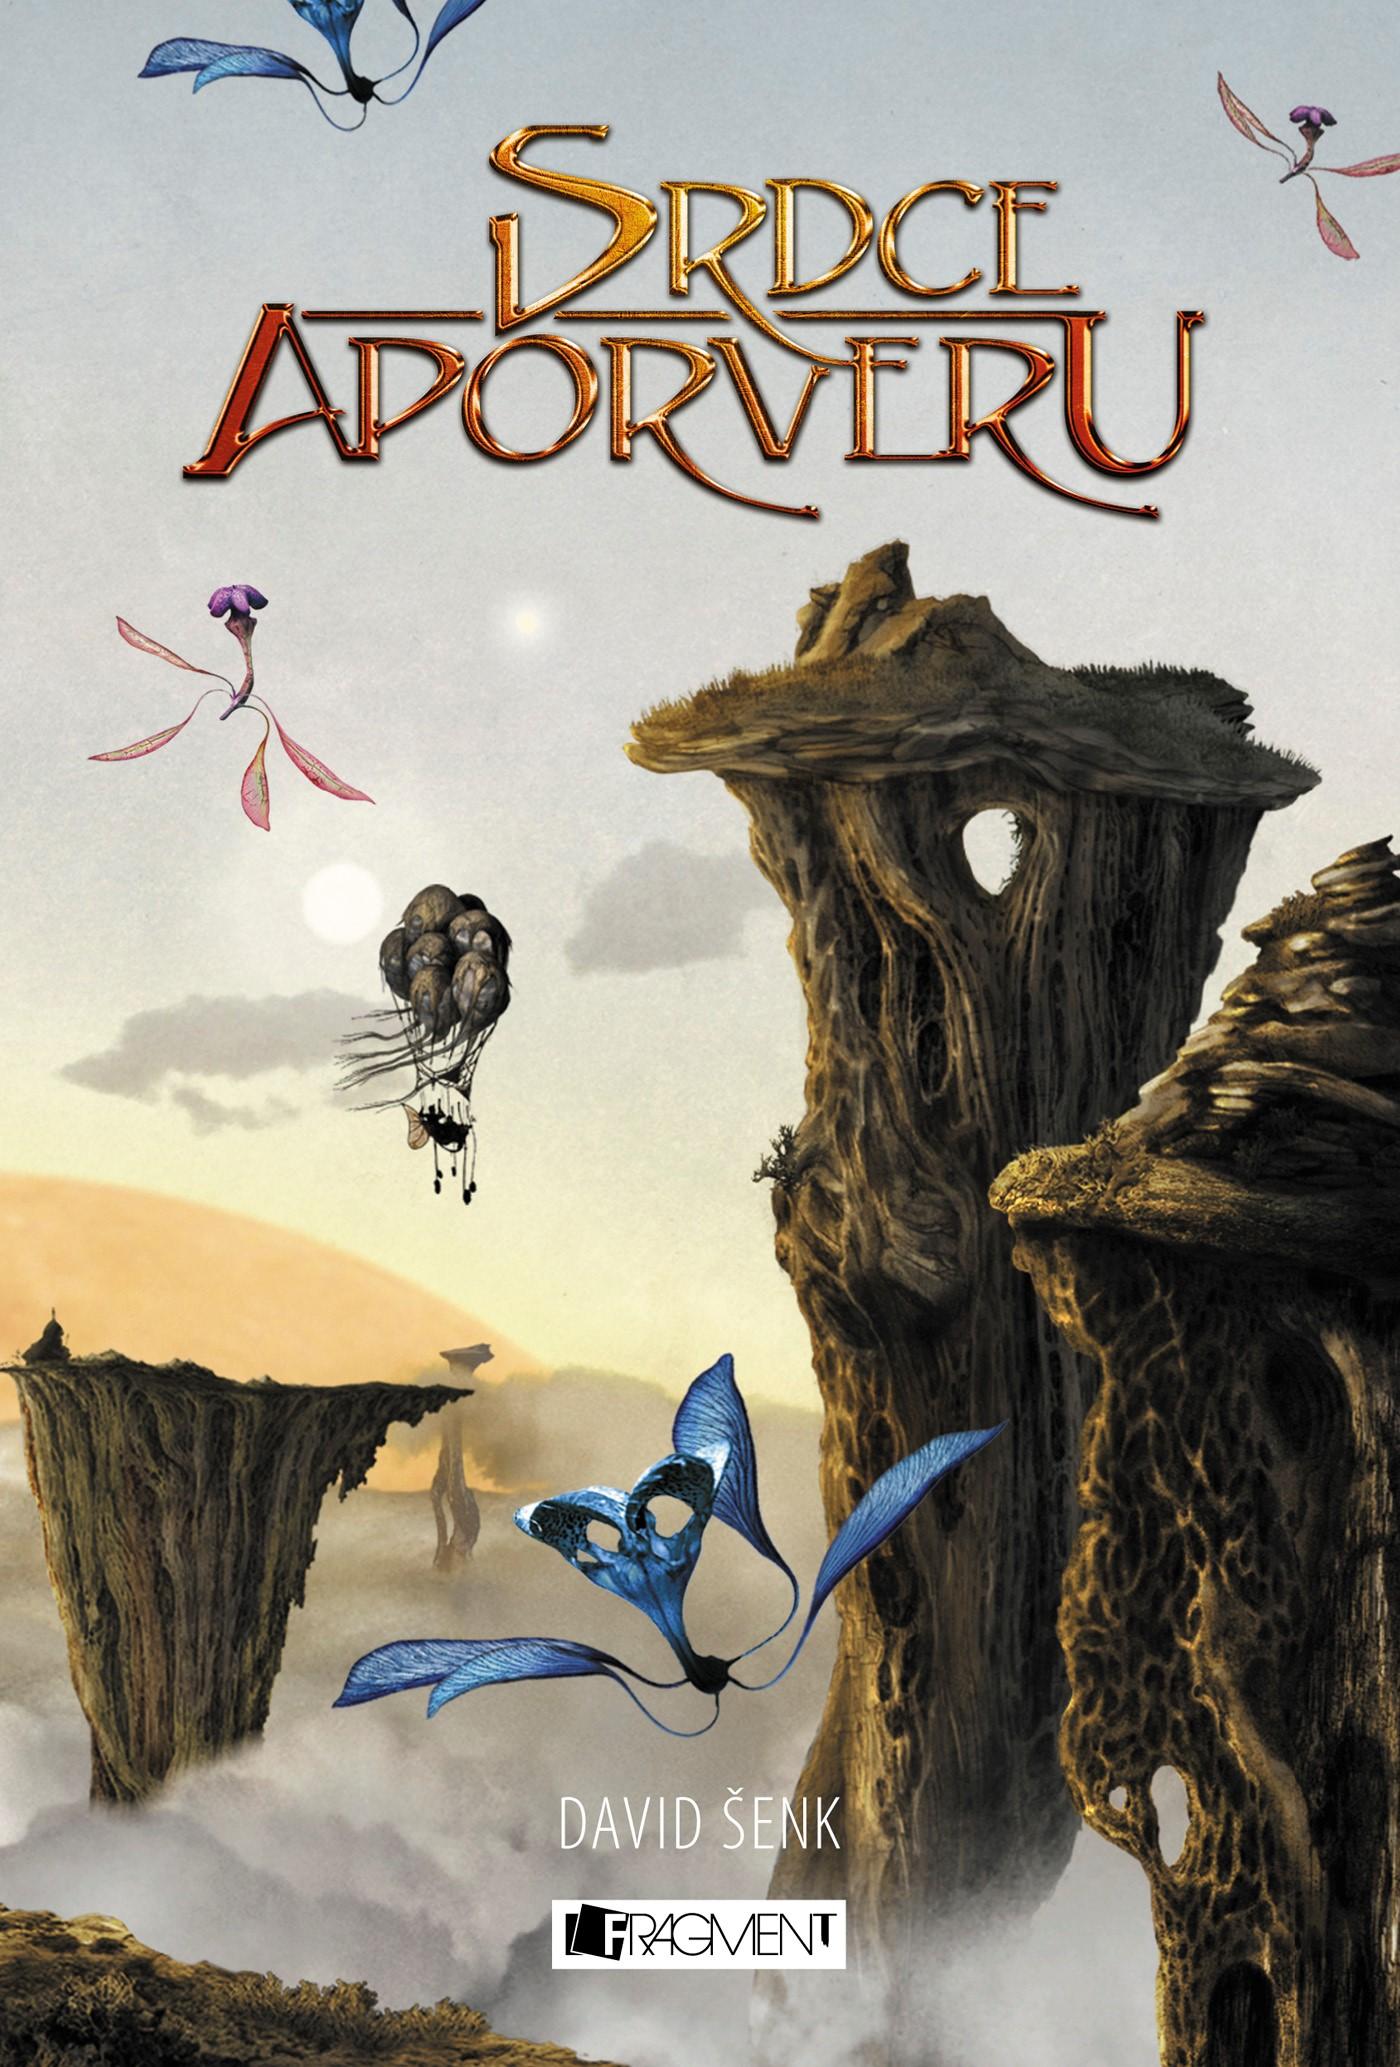 Srdce Aporveru